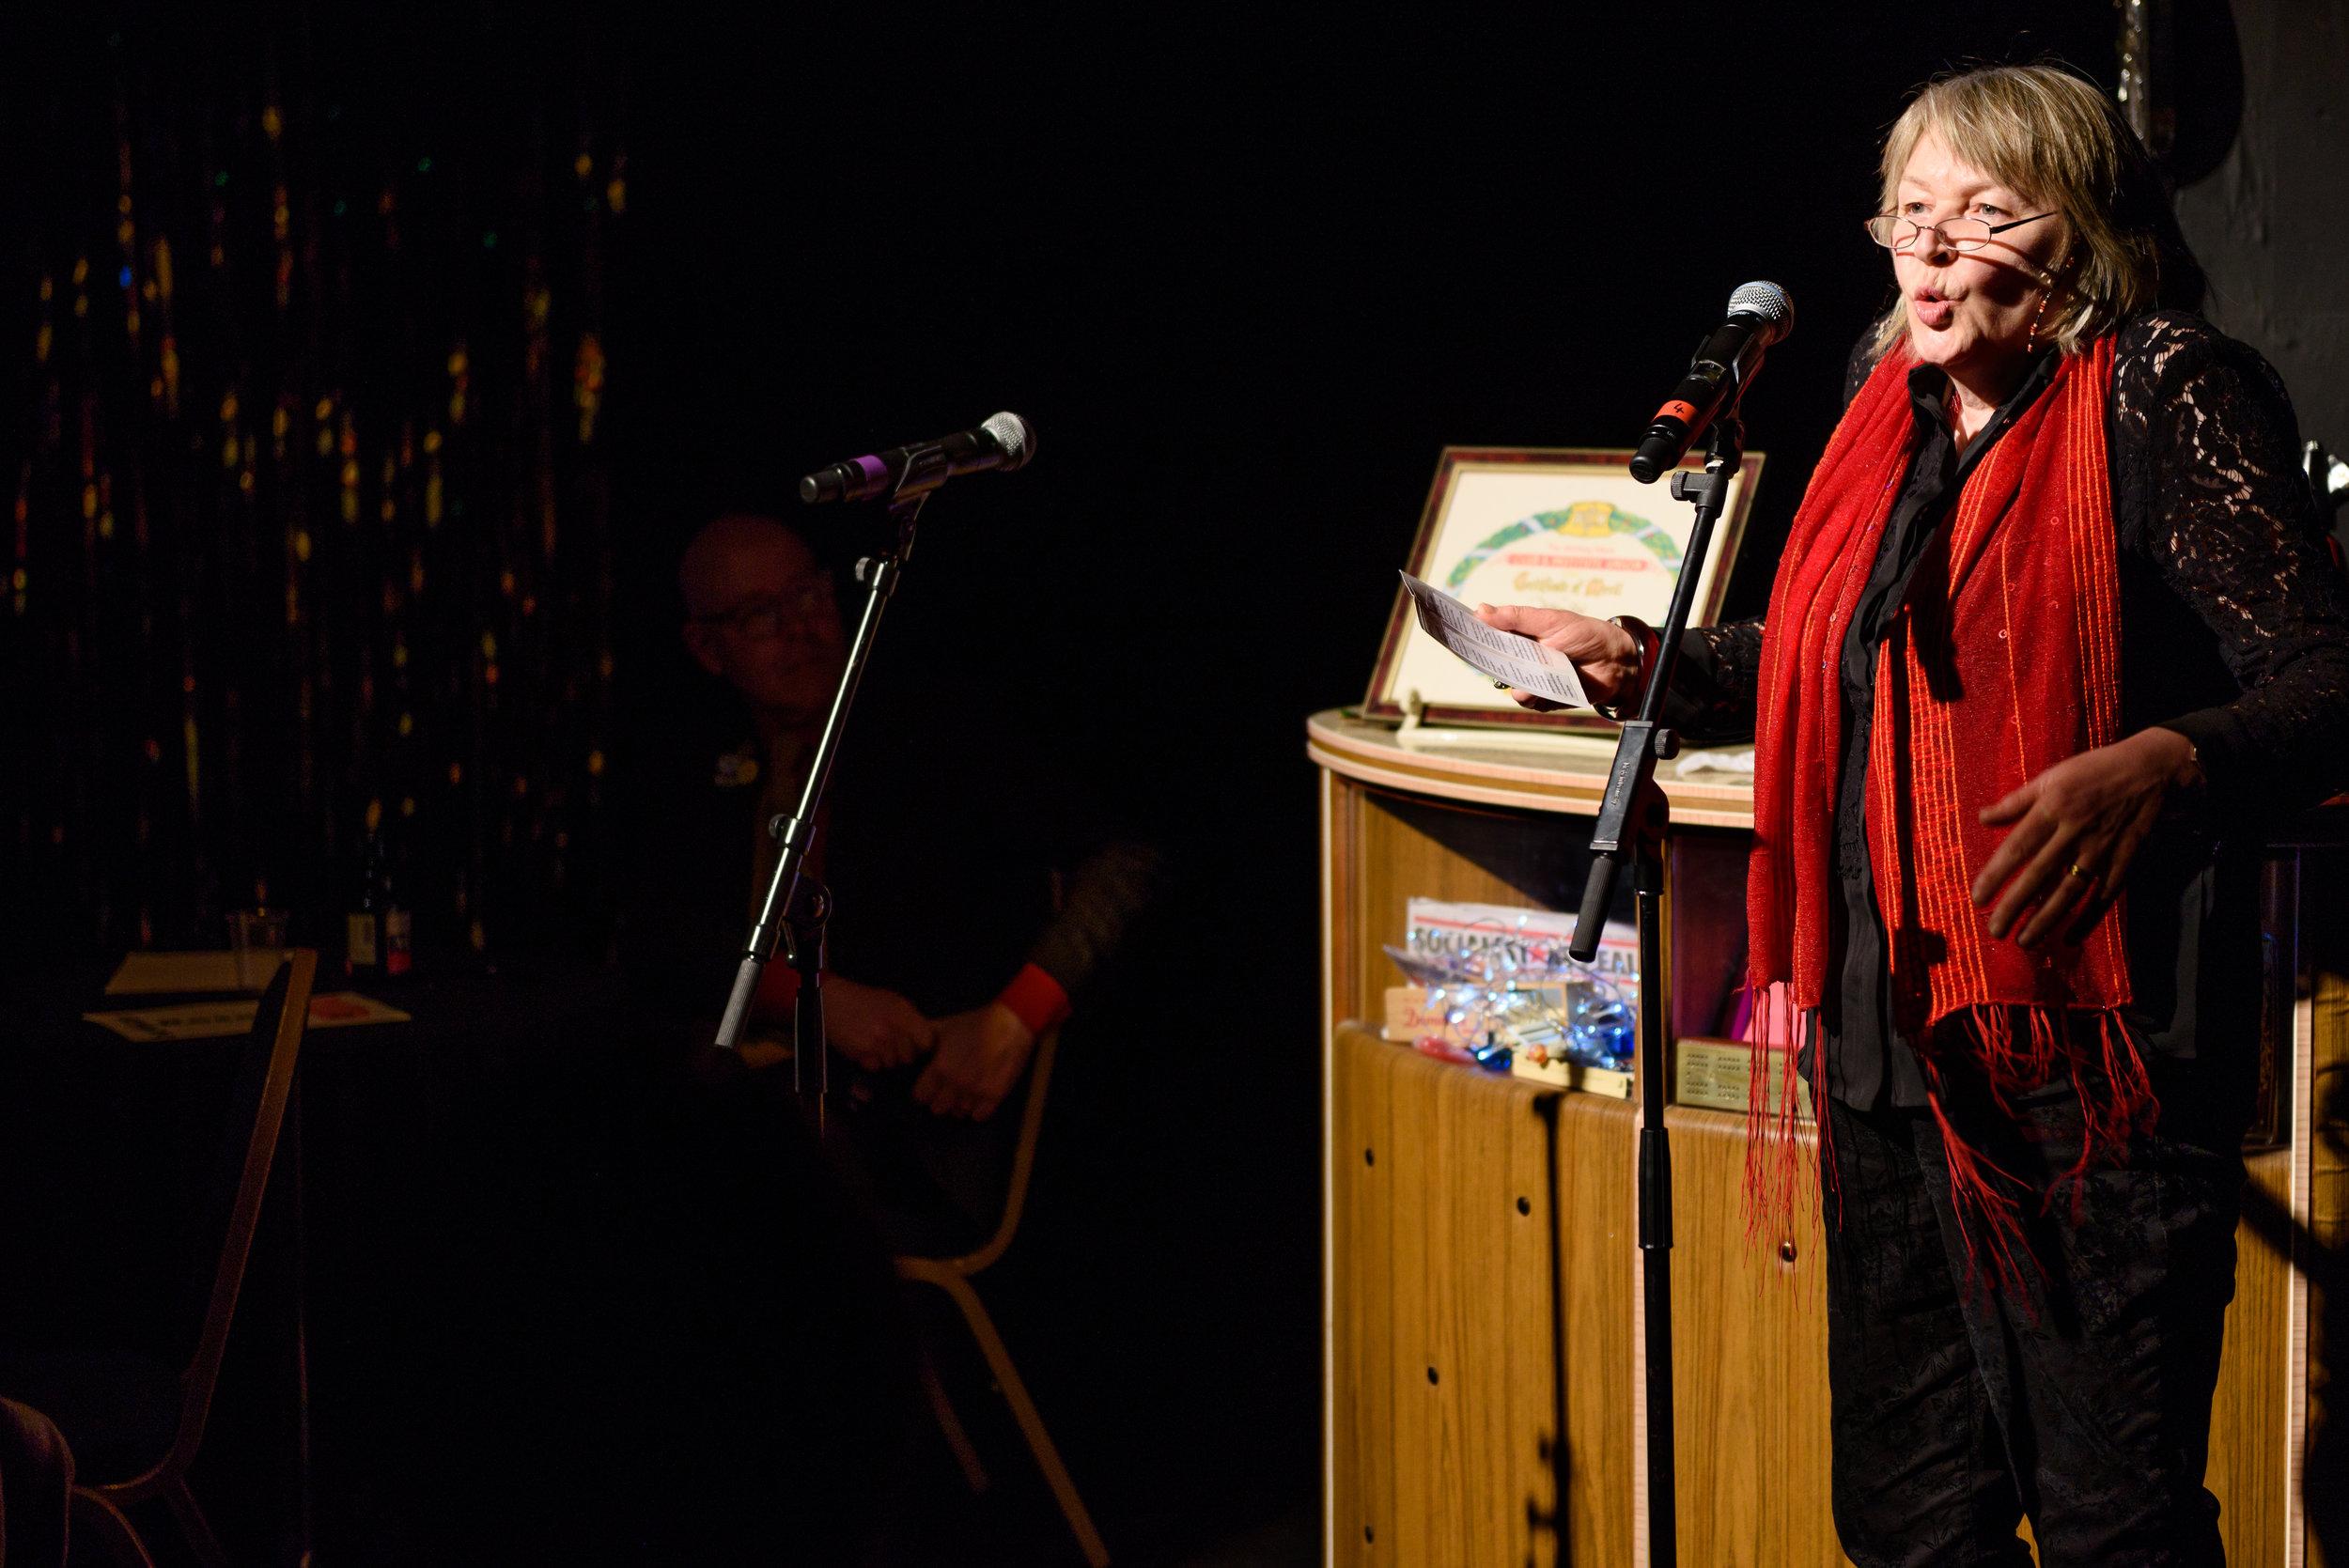 Ann Macaulay - Spoken Not Stirred